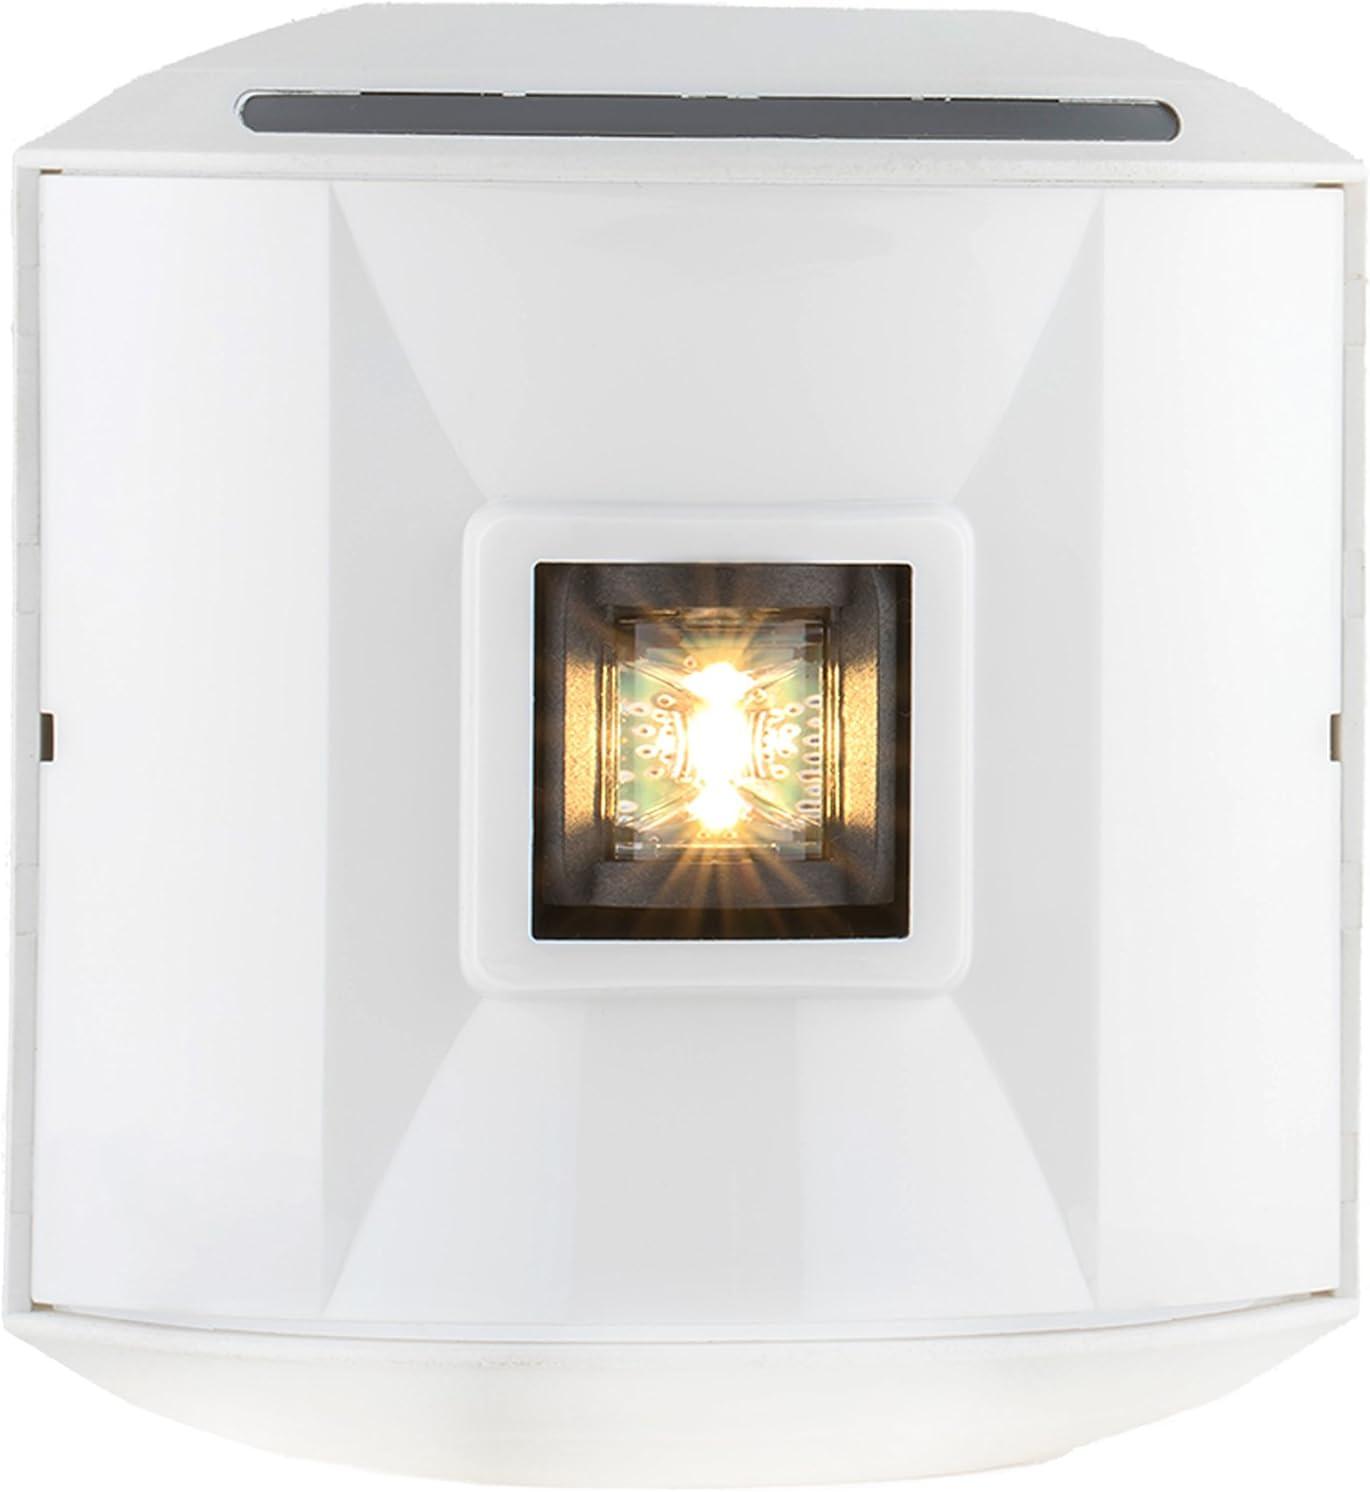 Aqua Signal 44501-7 Series Popular products 44 LED - Whit Light Navigation Stern Max 87% OFF